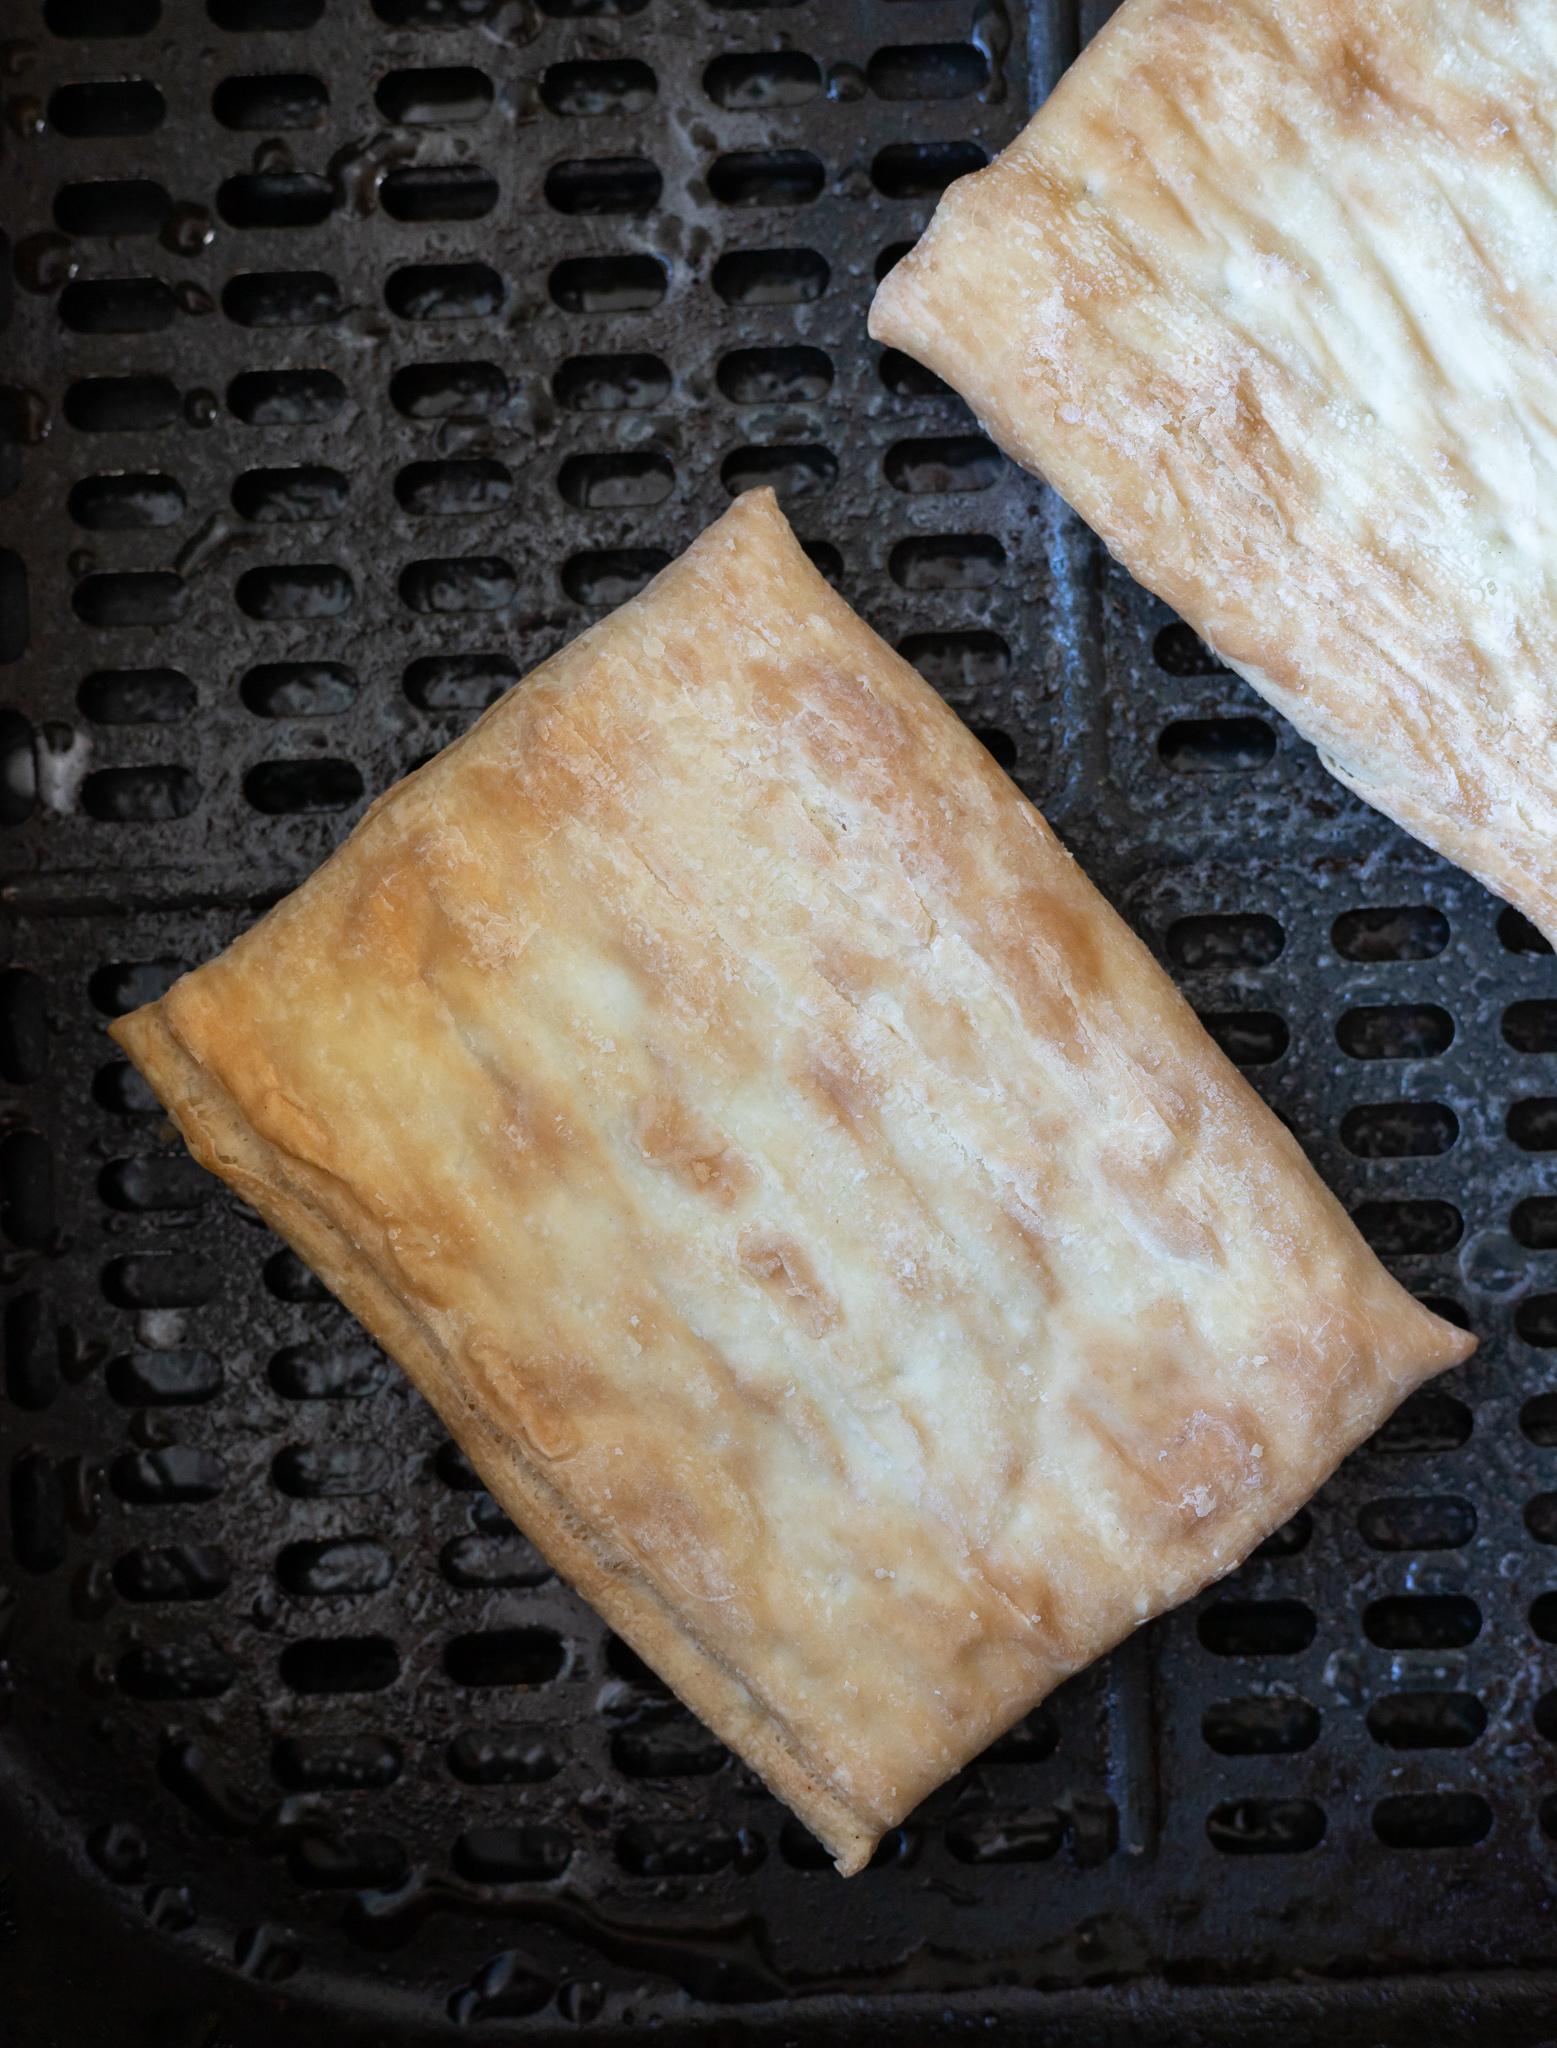 frozen toaster strudels in air fryer basket